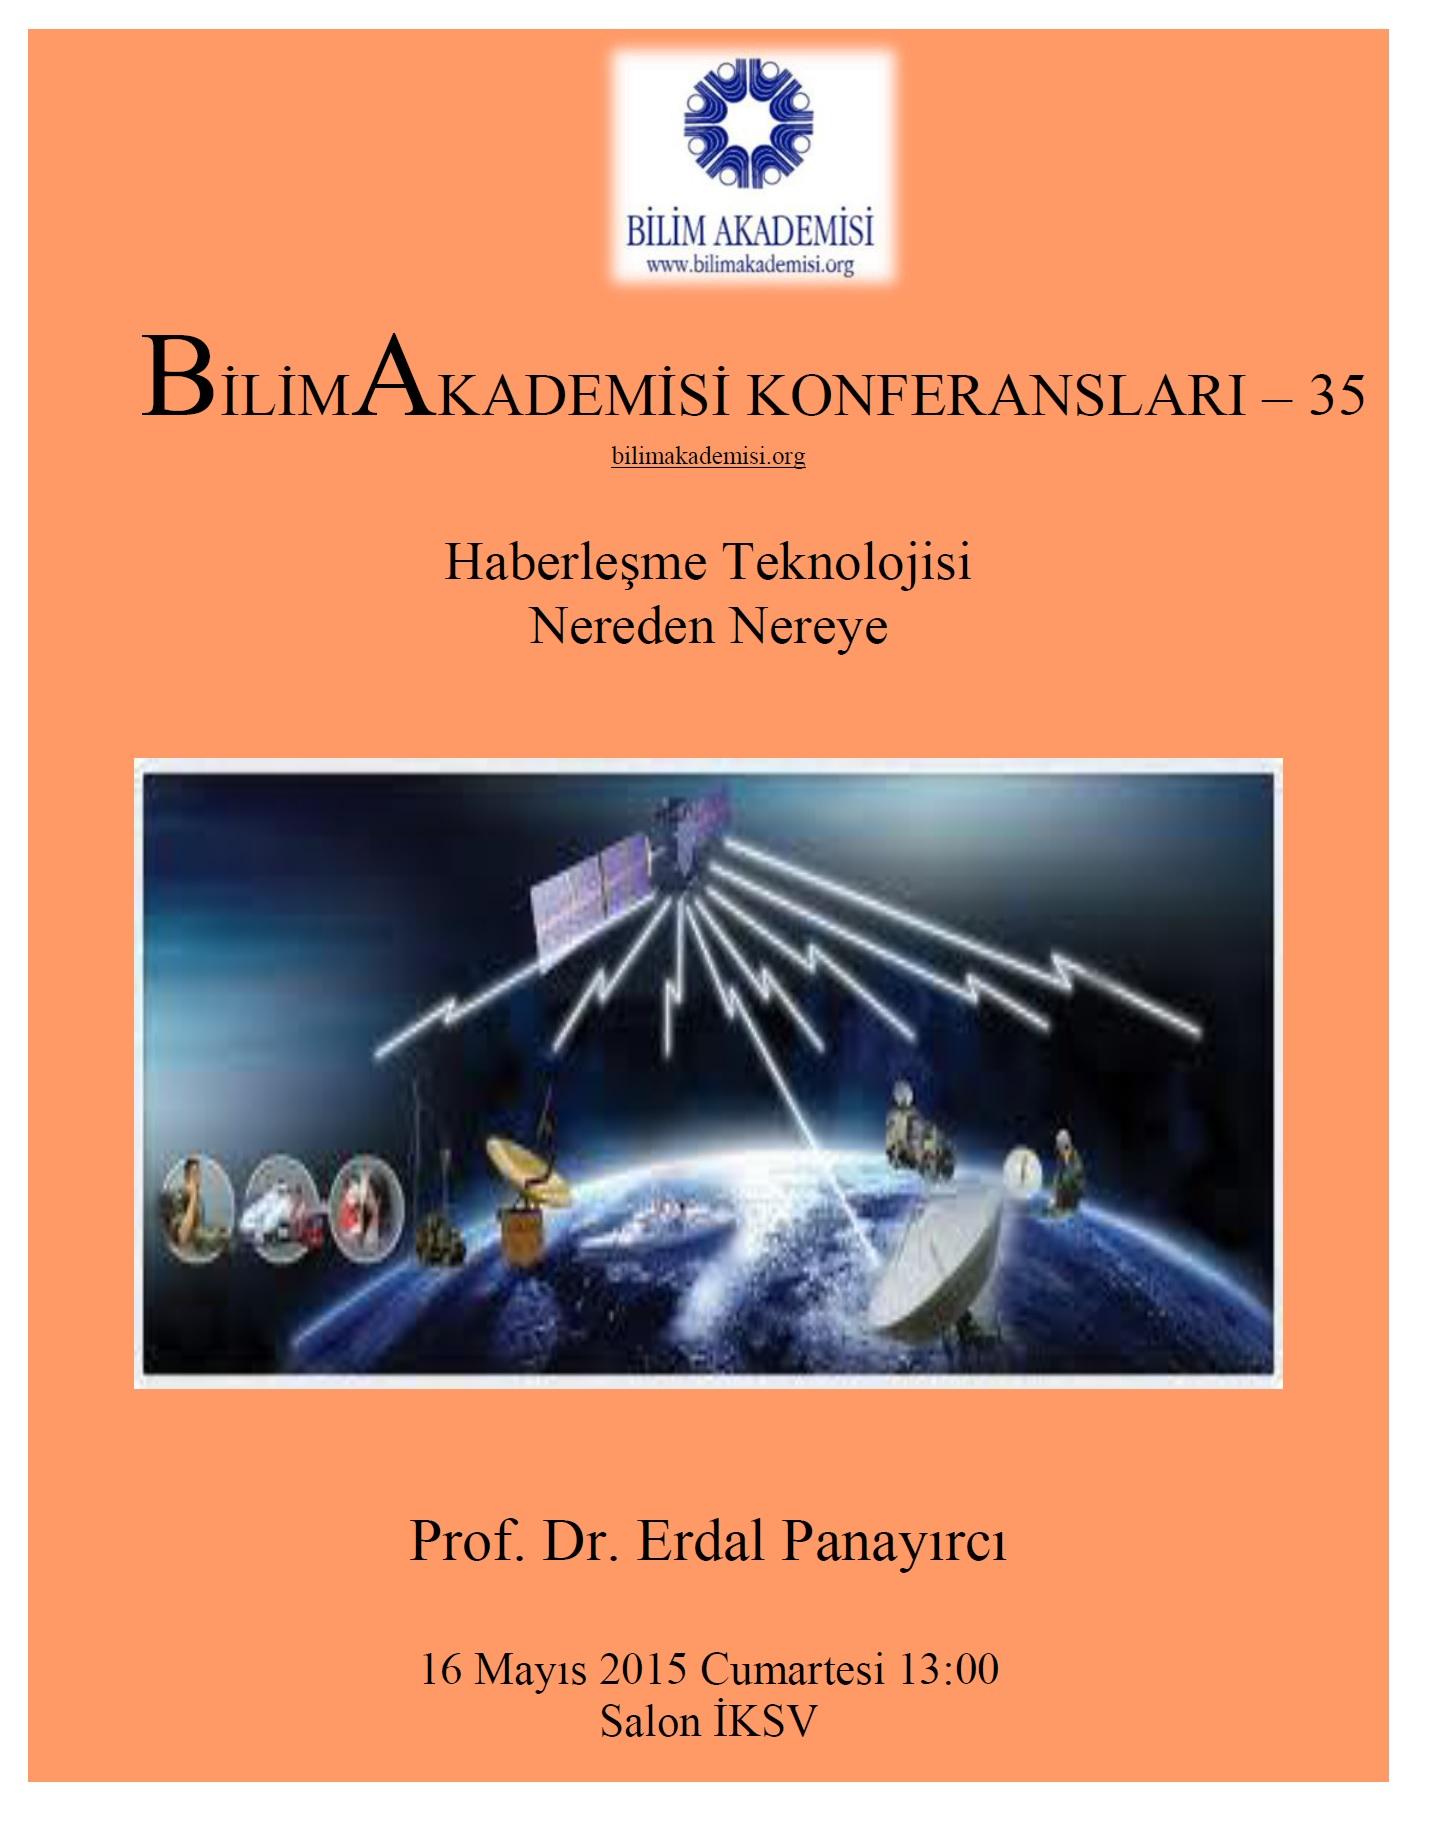 Past and Future of Communication Technology  – Speaker: Erdal Panayırcı